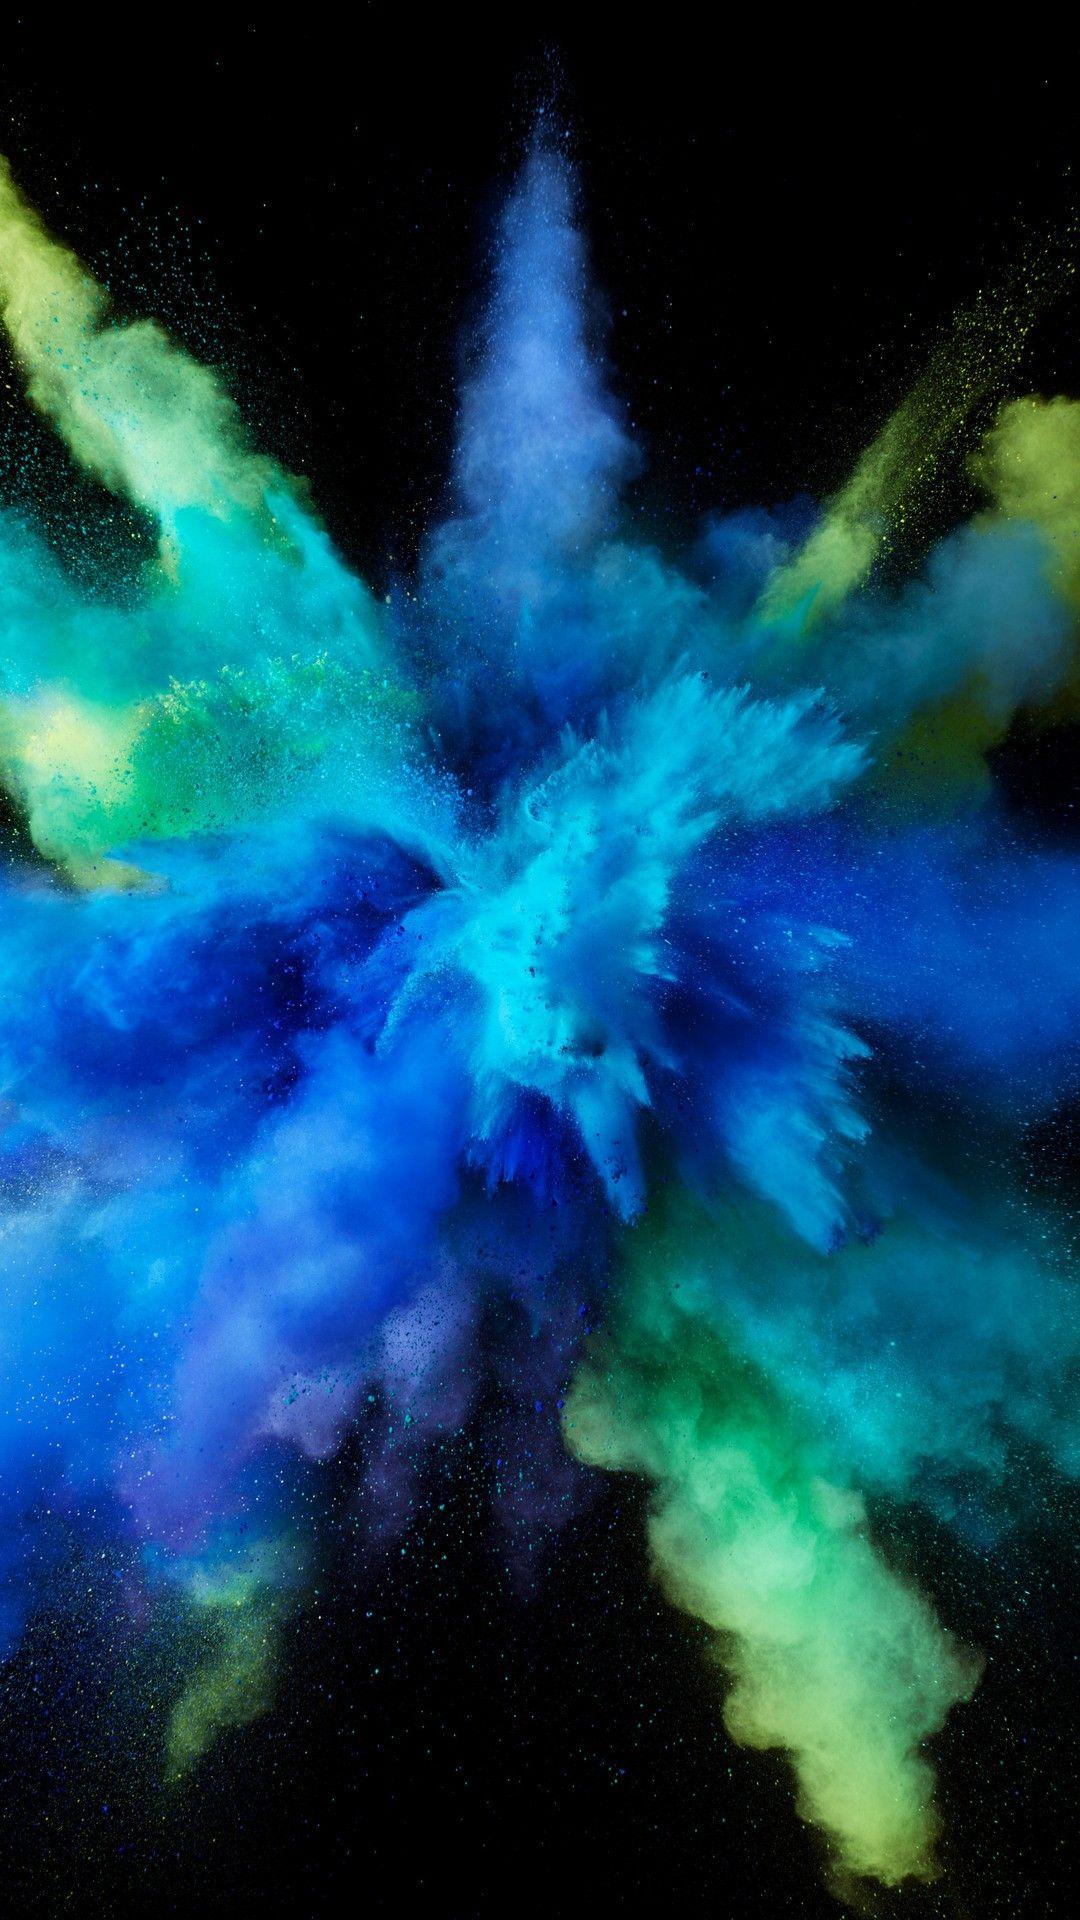 Mac Os Sierra Color Splash Blue Hd Wallpaper